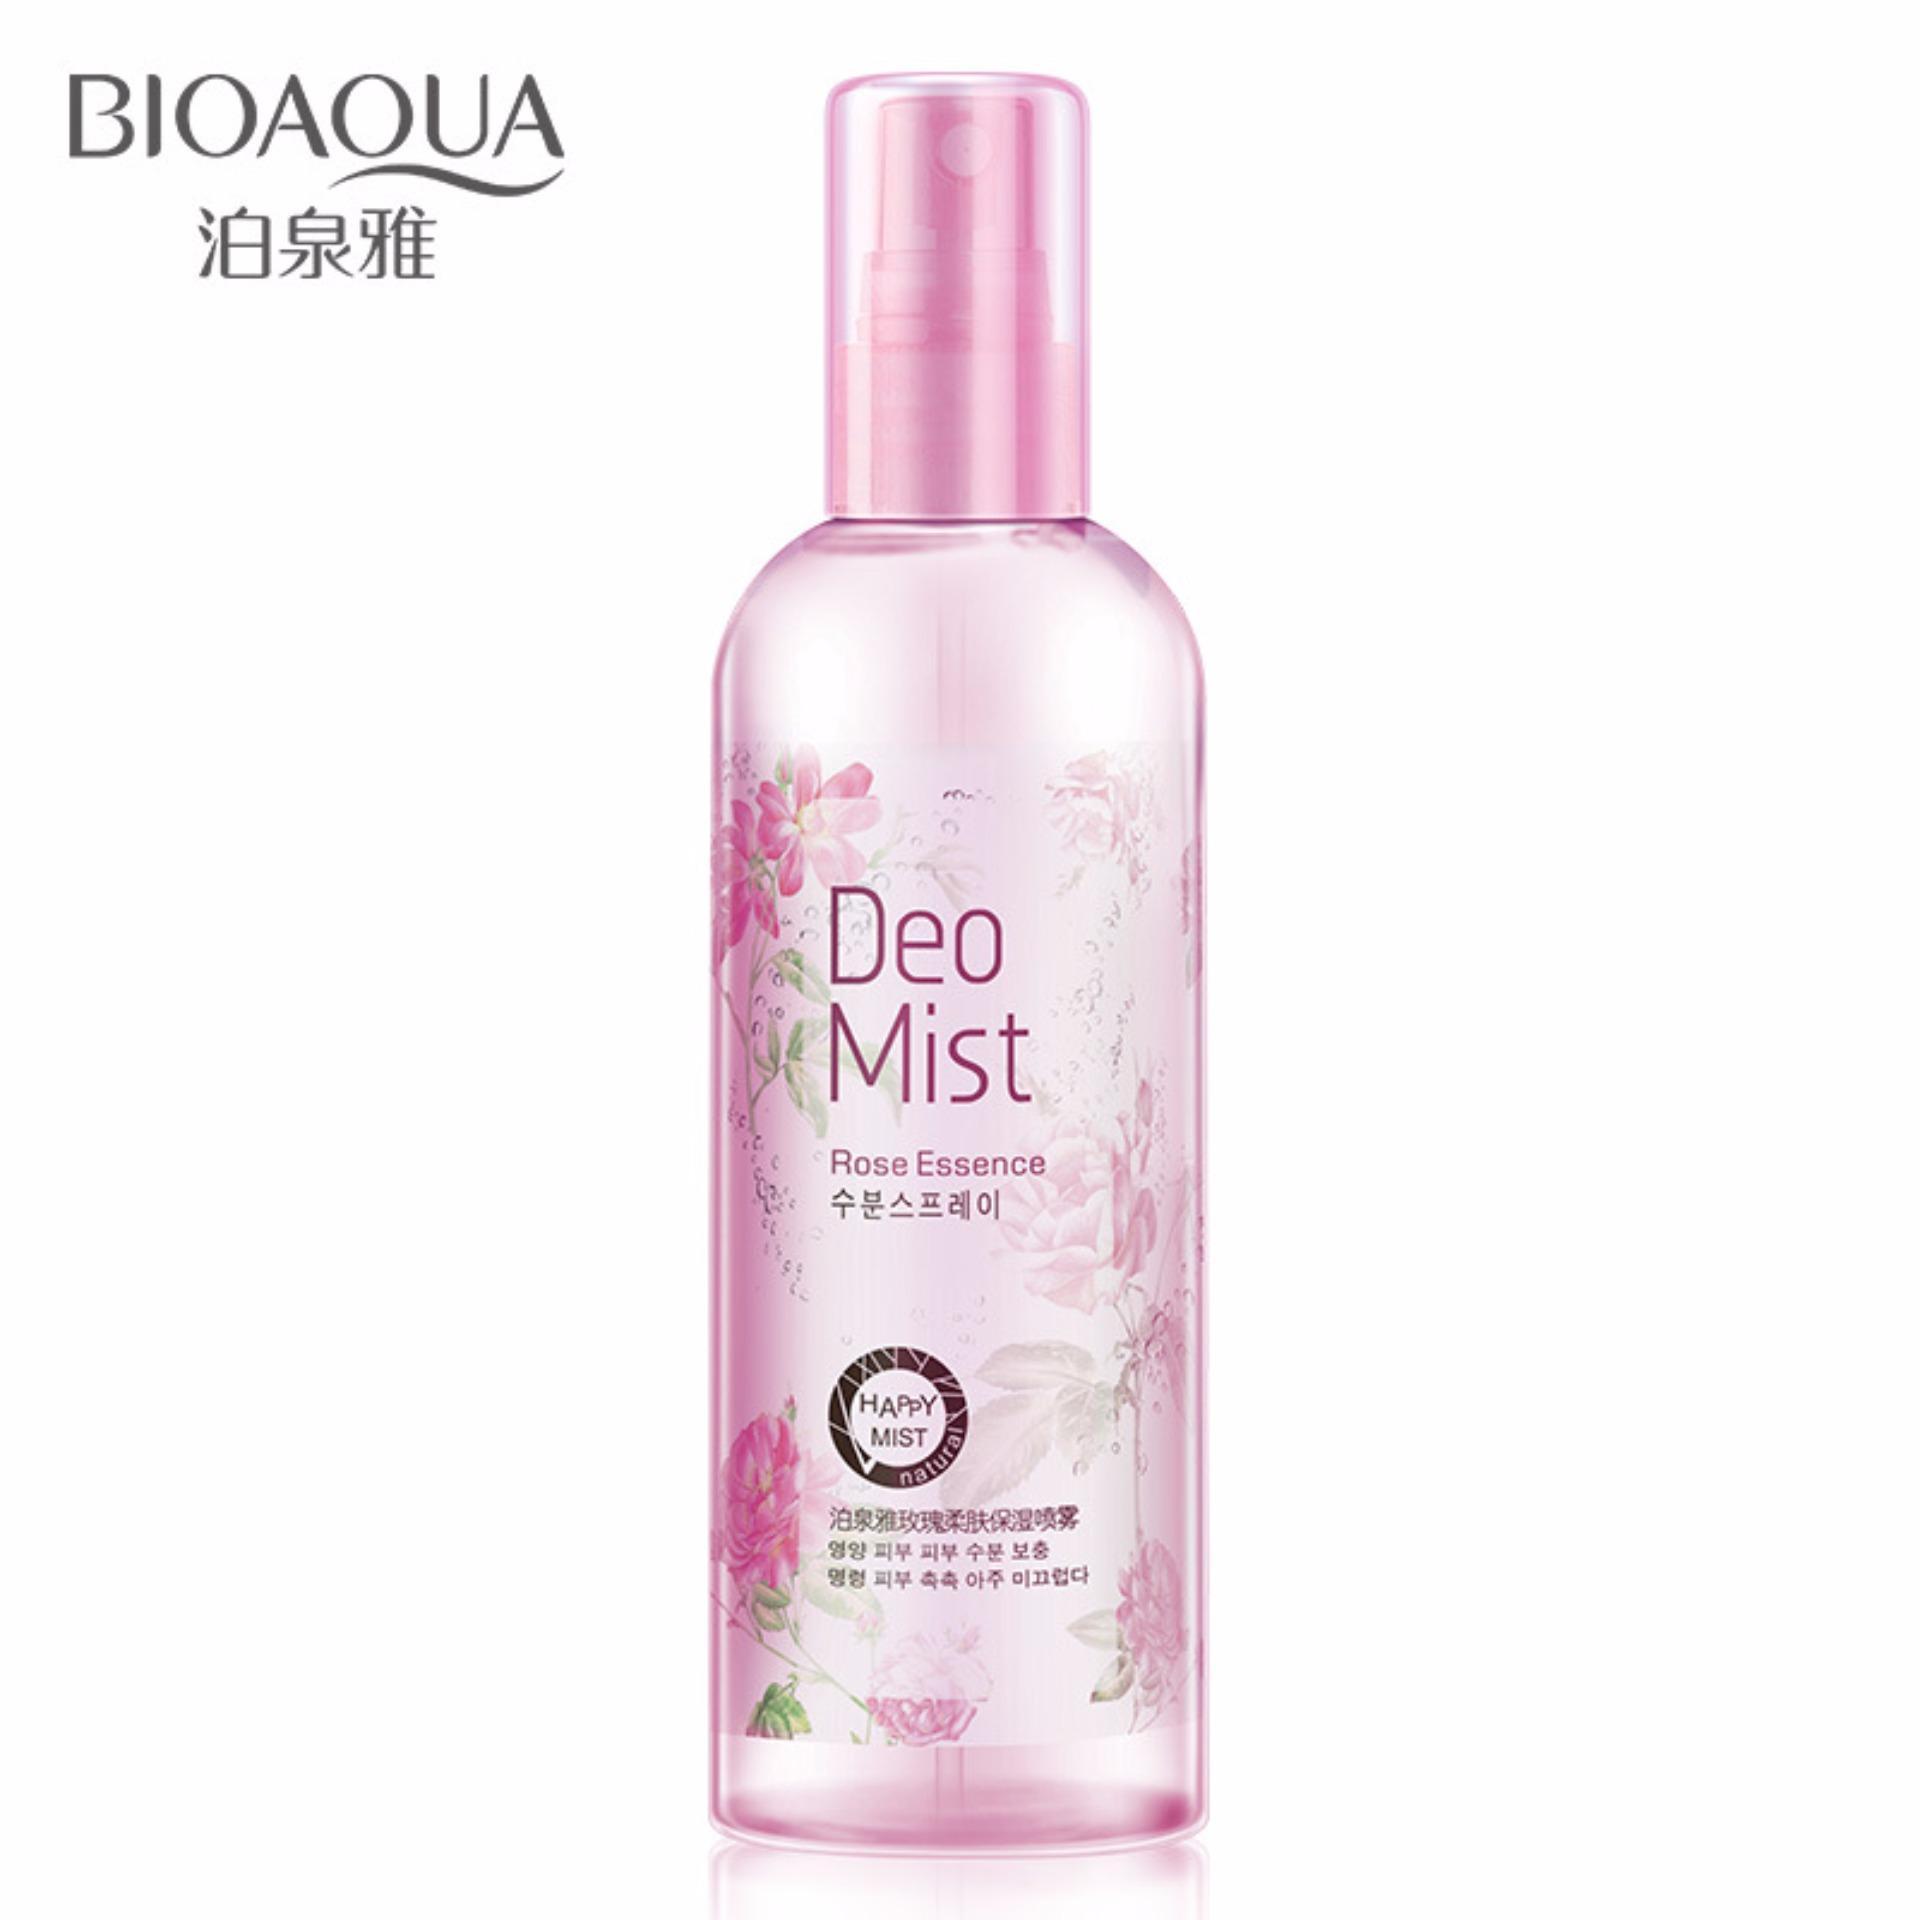 Bioaqua Rose Essence Deo Mist Whitening Anti-aging Rose SkinMoisturizing Spray Oil Control And Relieve Pores